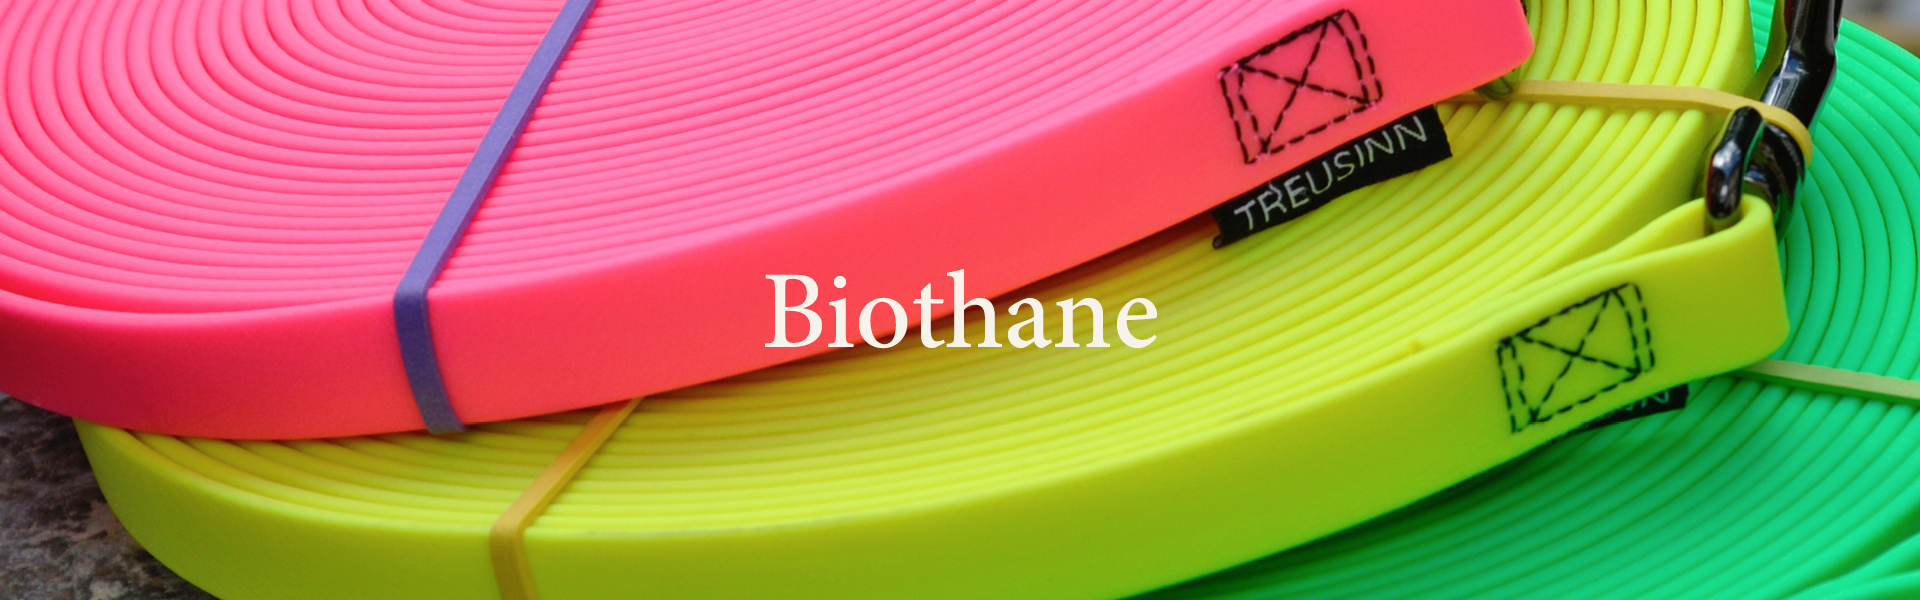 Kategorieseite_biothane